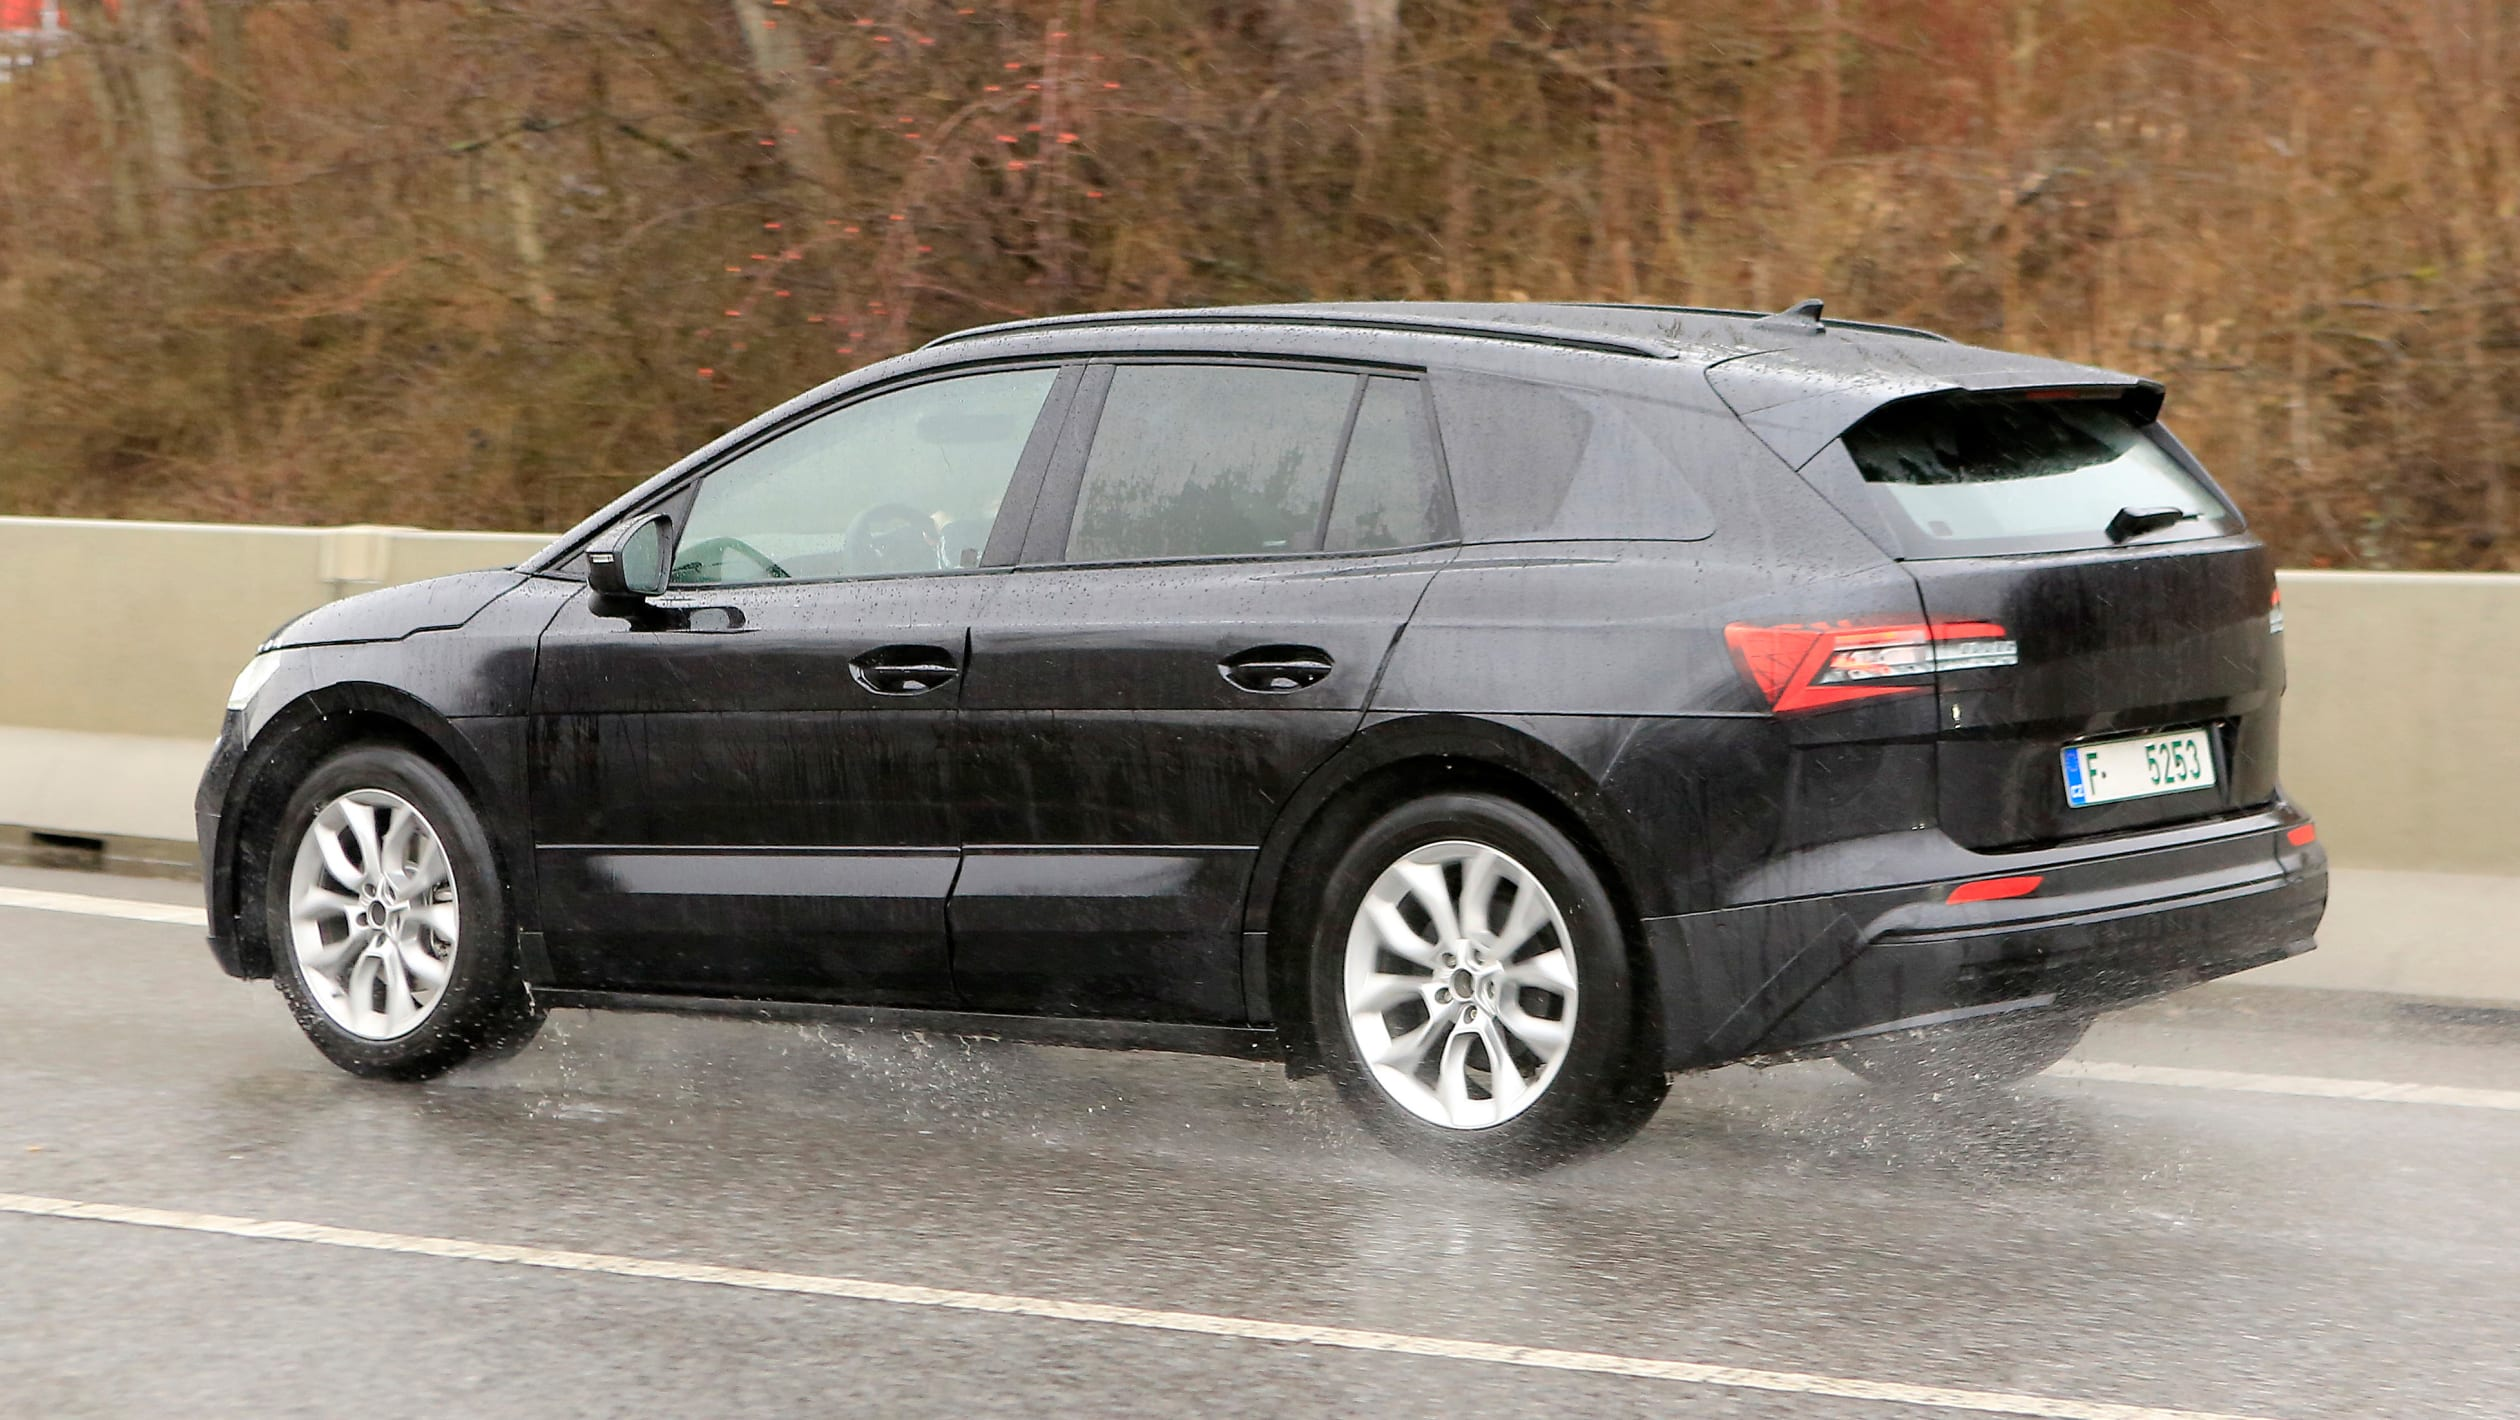 2021 - [Skoda] SUV EV - Page 3 2021%20Skoda%20Enyaq%20spied-8